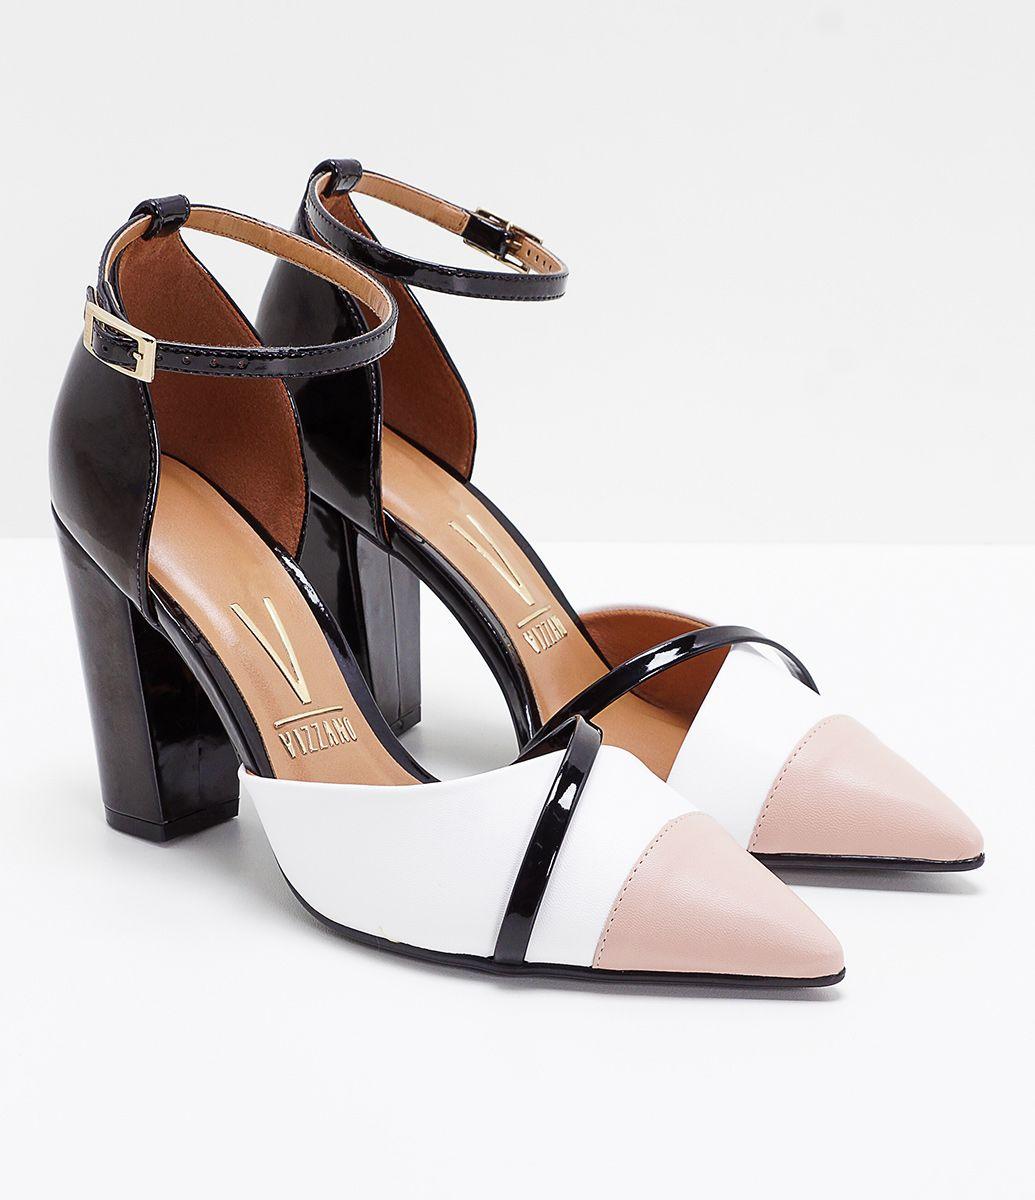 821c1afc4 Sapato feminino Material: sintético Modelo scarpin Tricolor Marca: Vizzano  Bico fino Salto grosso COLEÇÃO